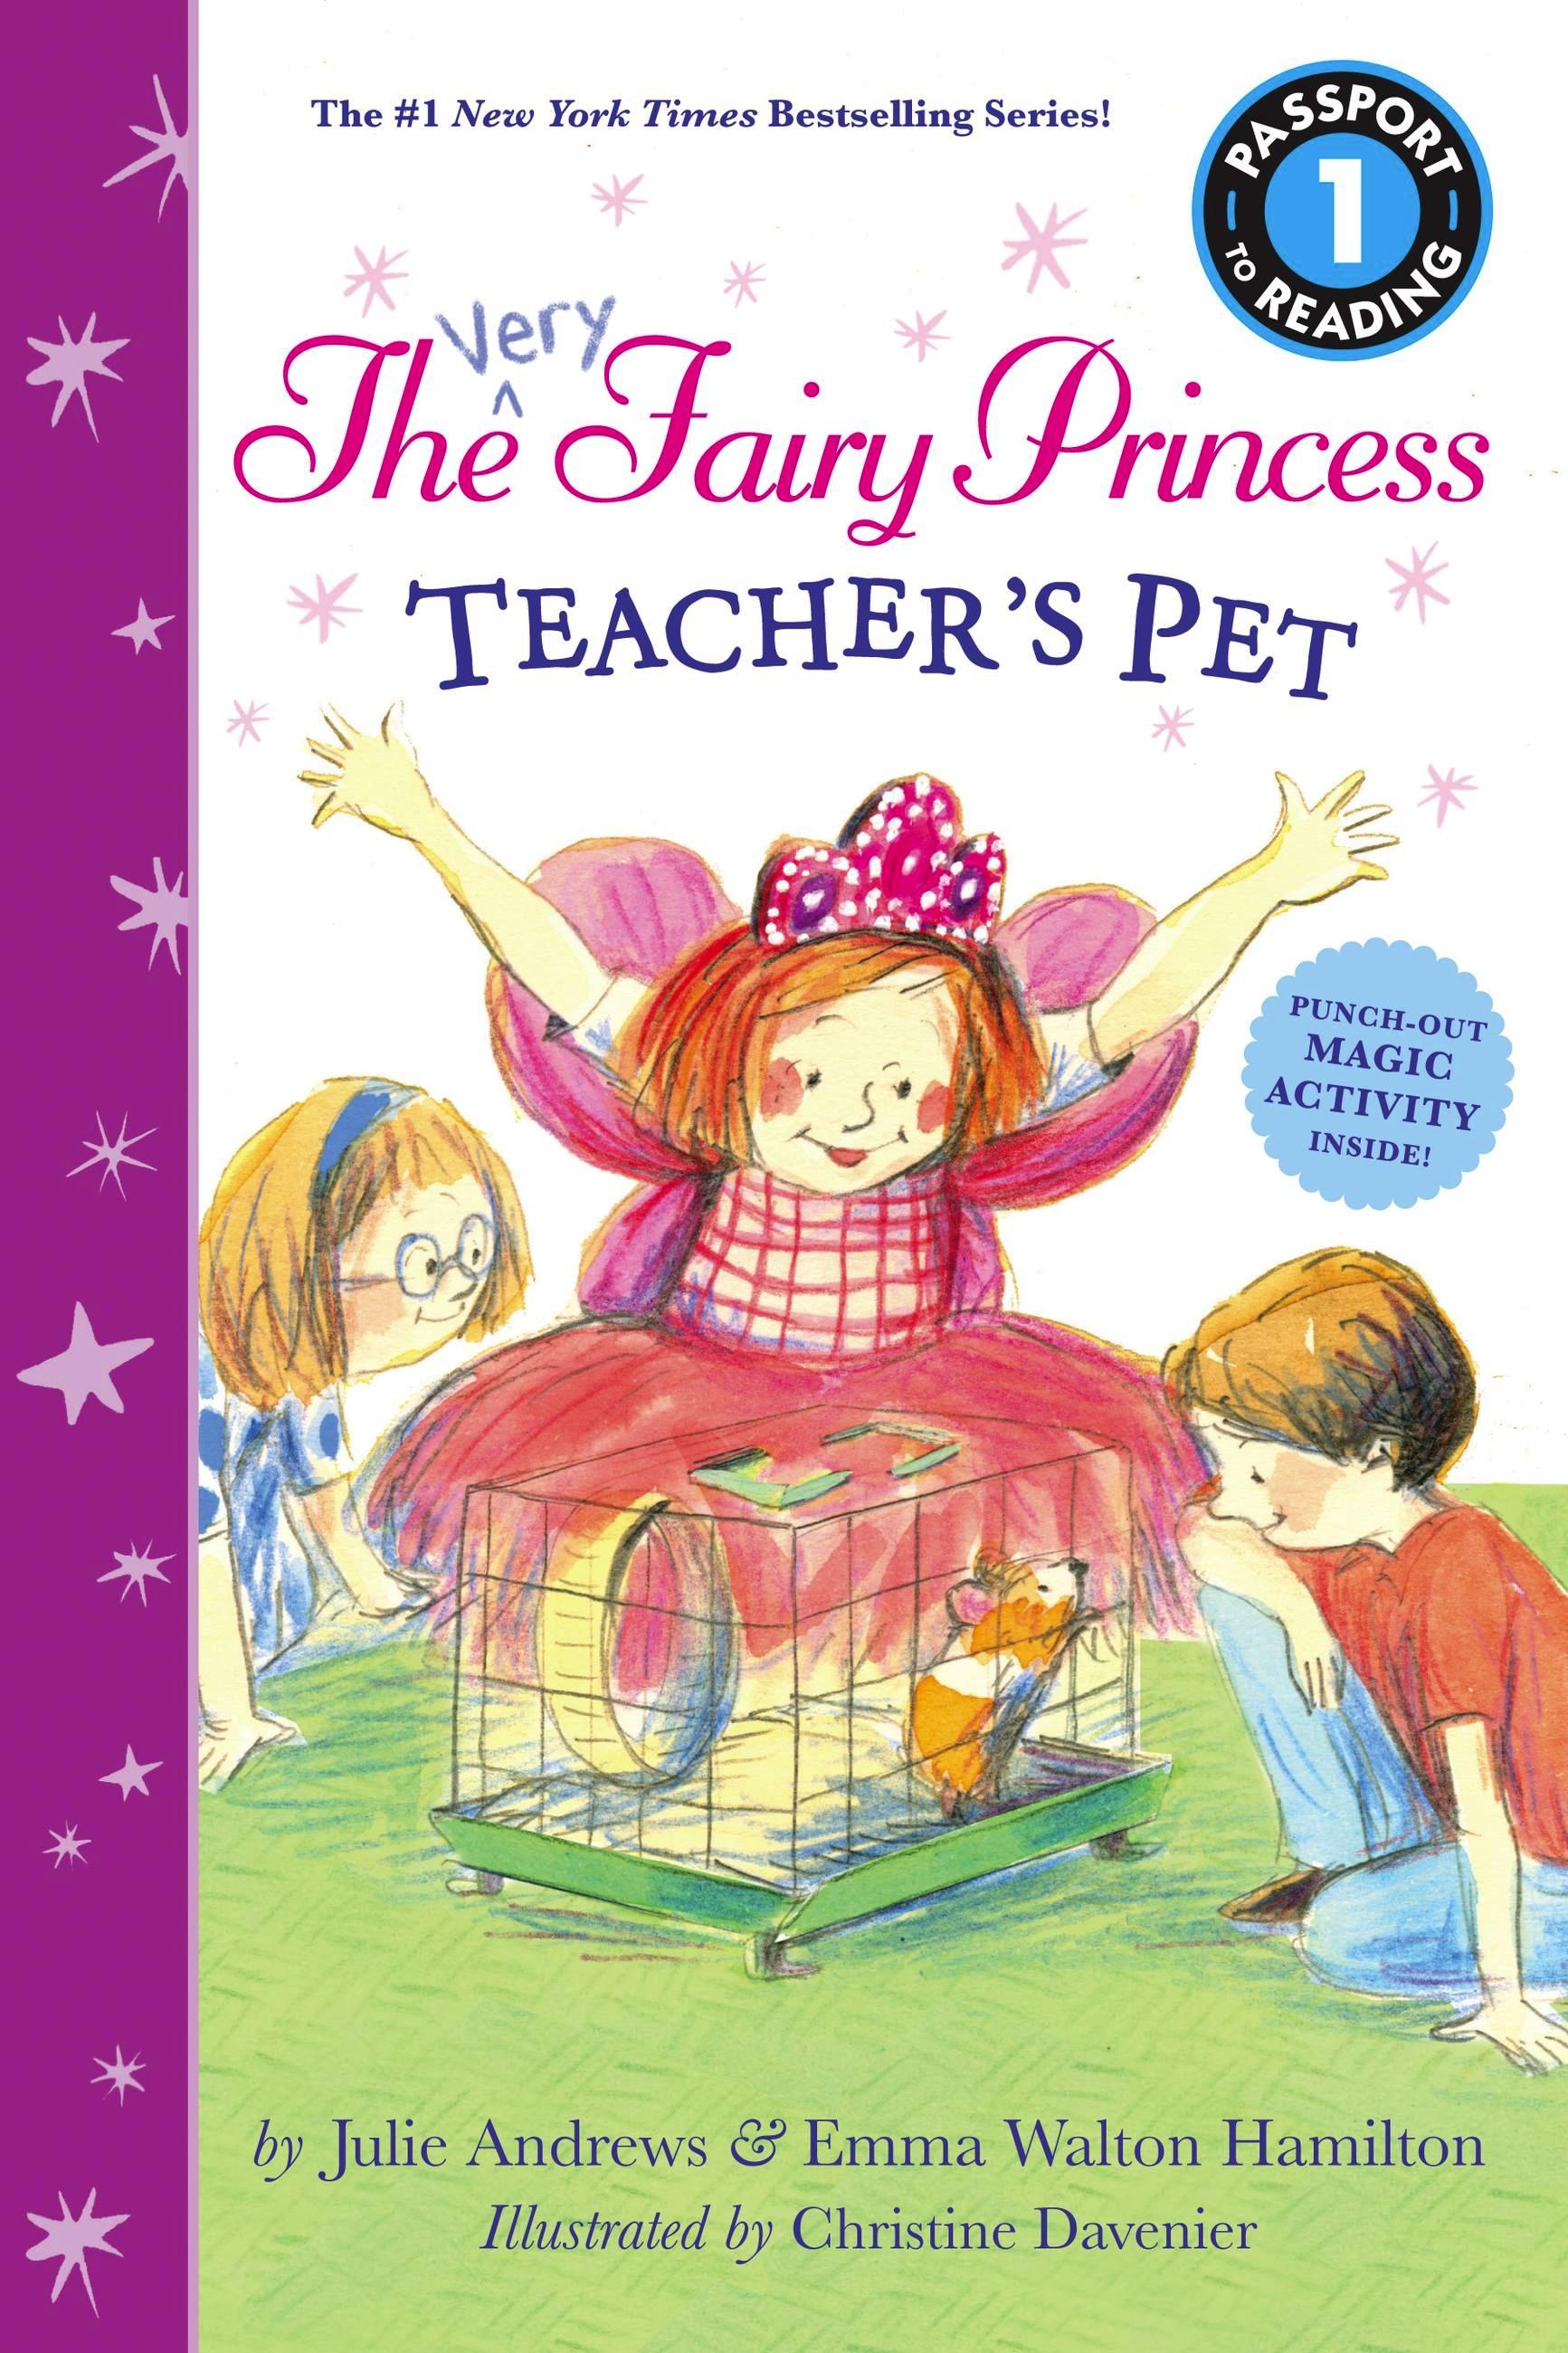 The Very Fairy Princess: Teacher's Pet by Julie Andrews | Hachette Book  Group